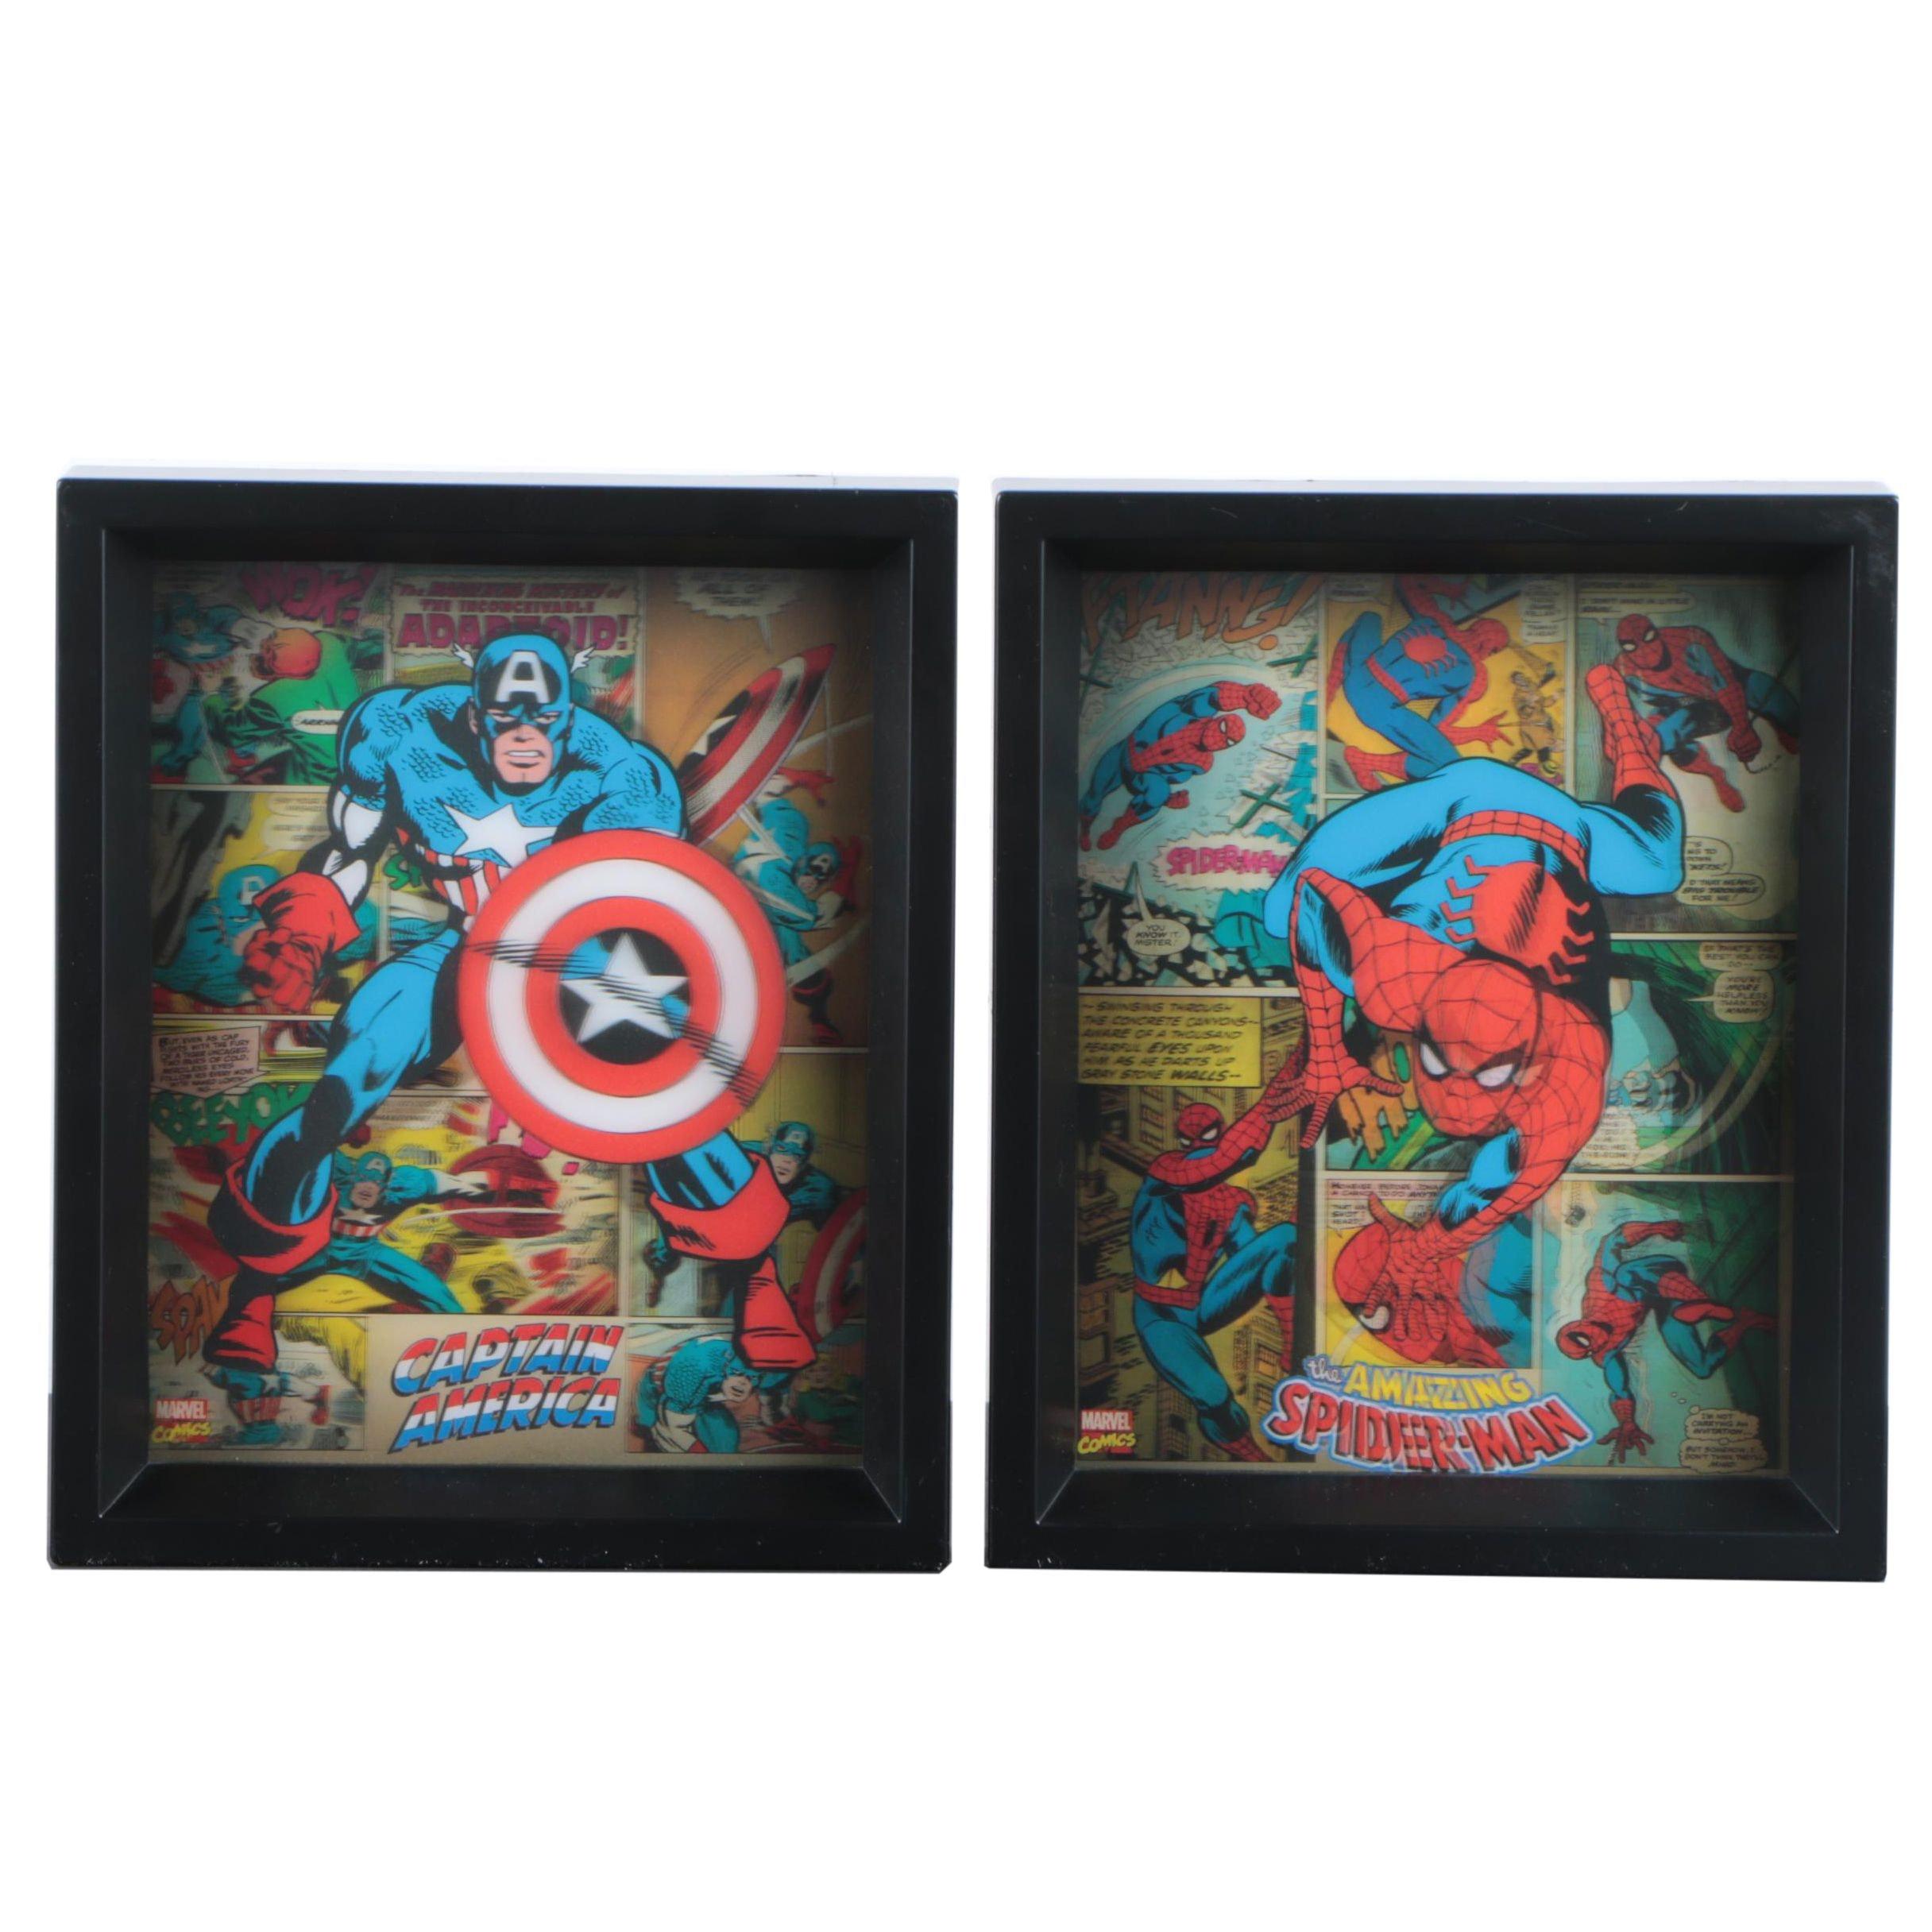 Marvel Comics Lenticular Wall Art of Spider-Man and Captain America